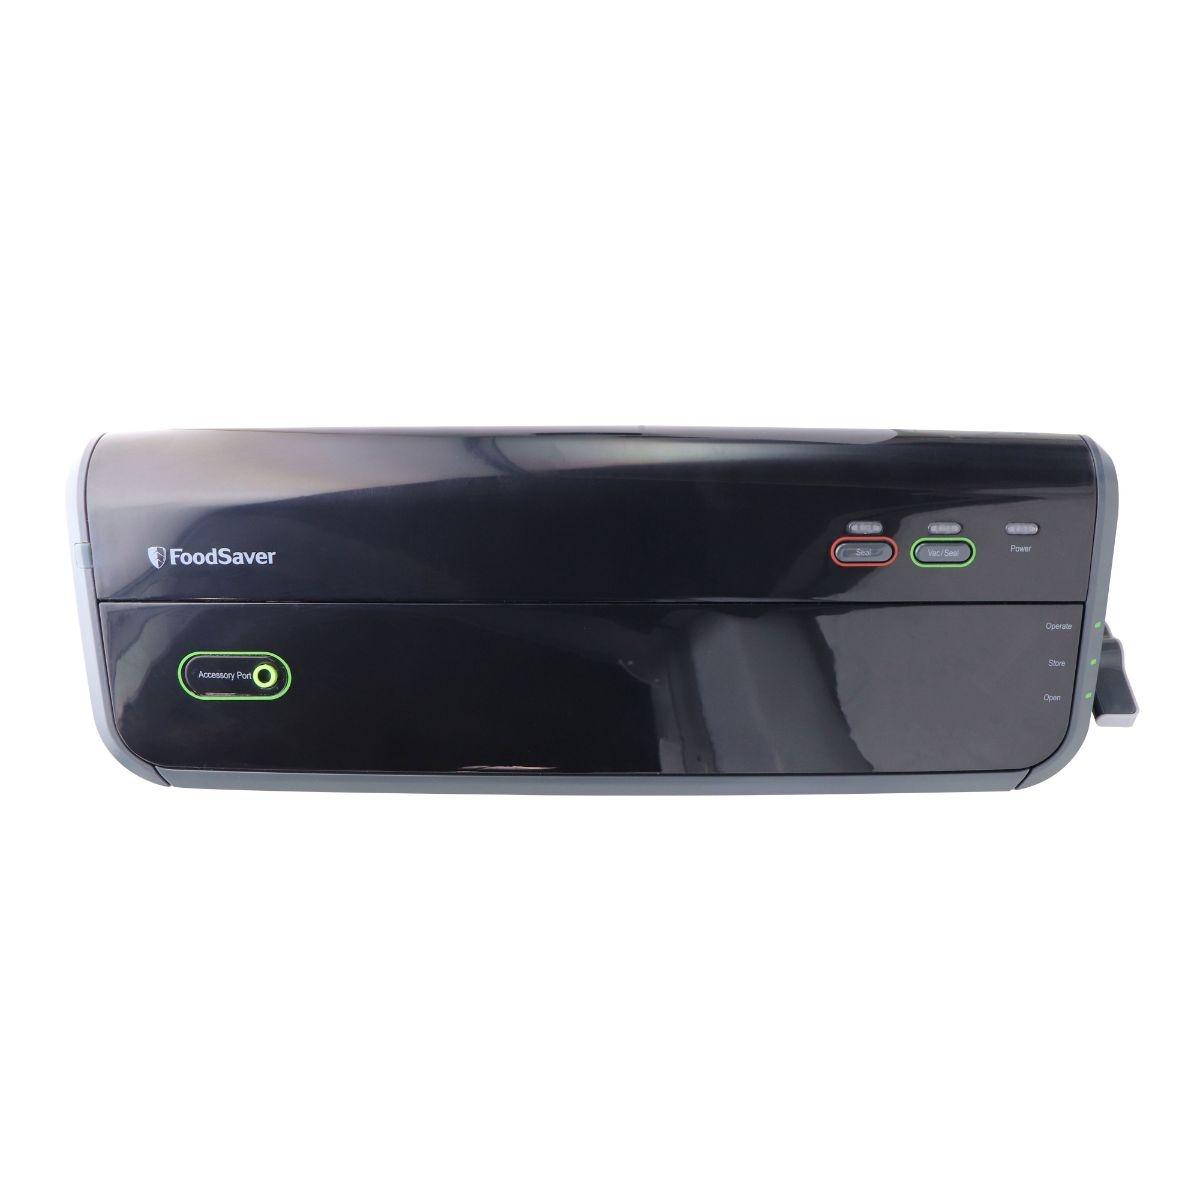 FoodSaver FM2000-000 Vacuum Sealing System - Black